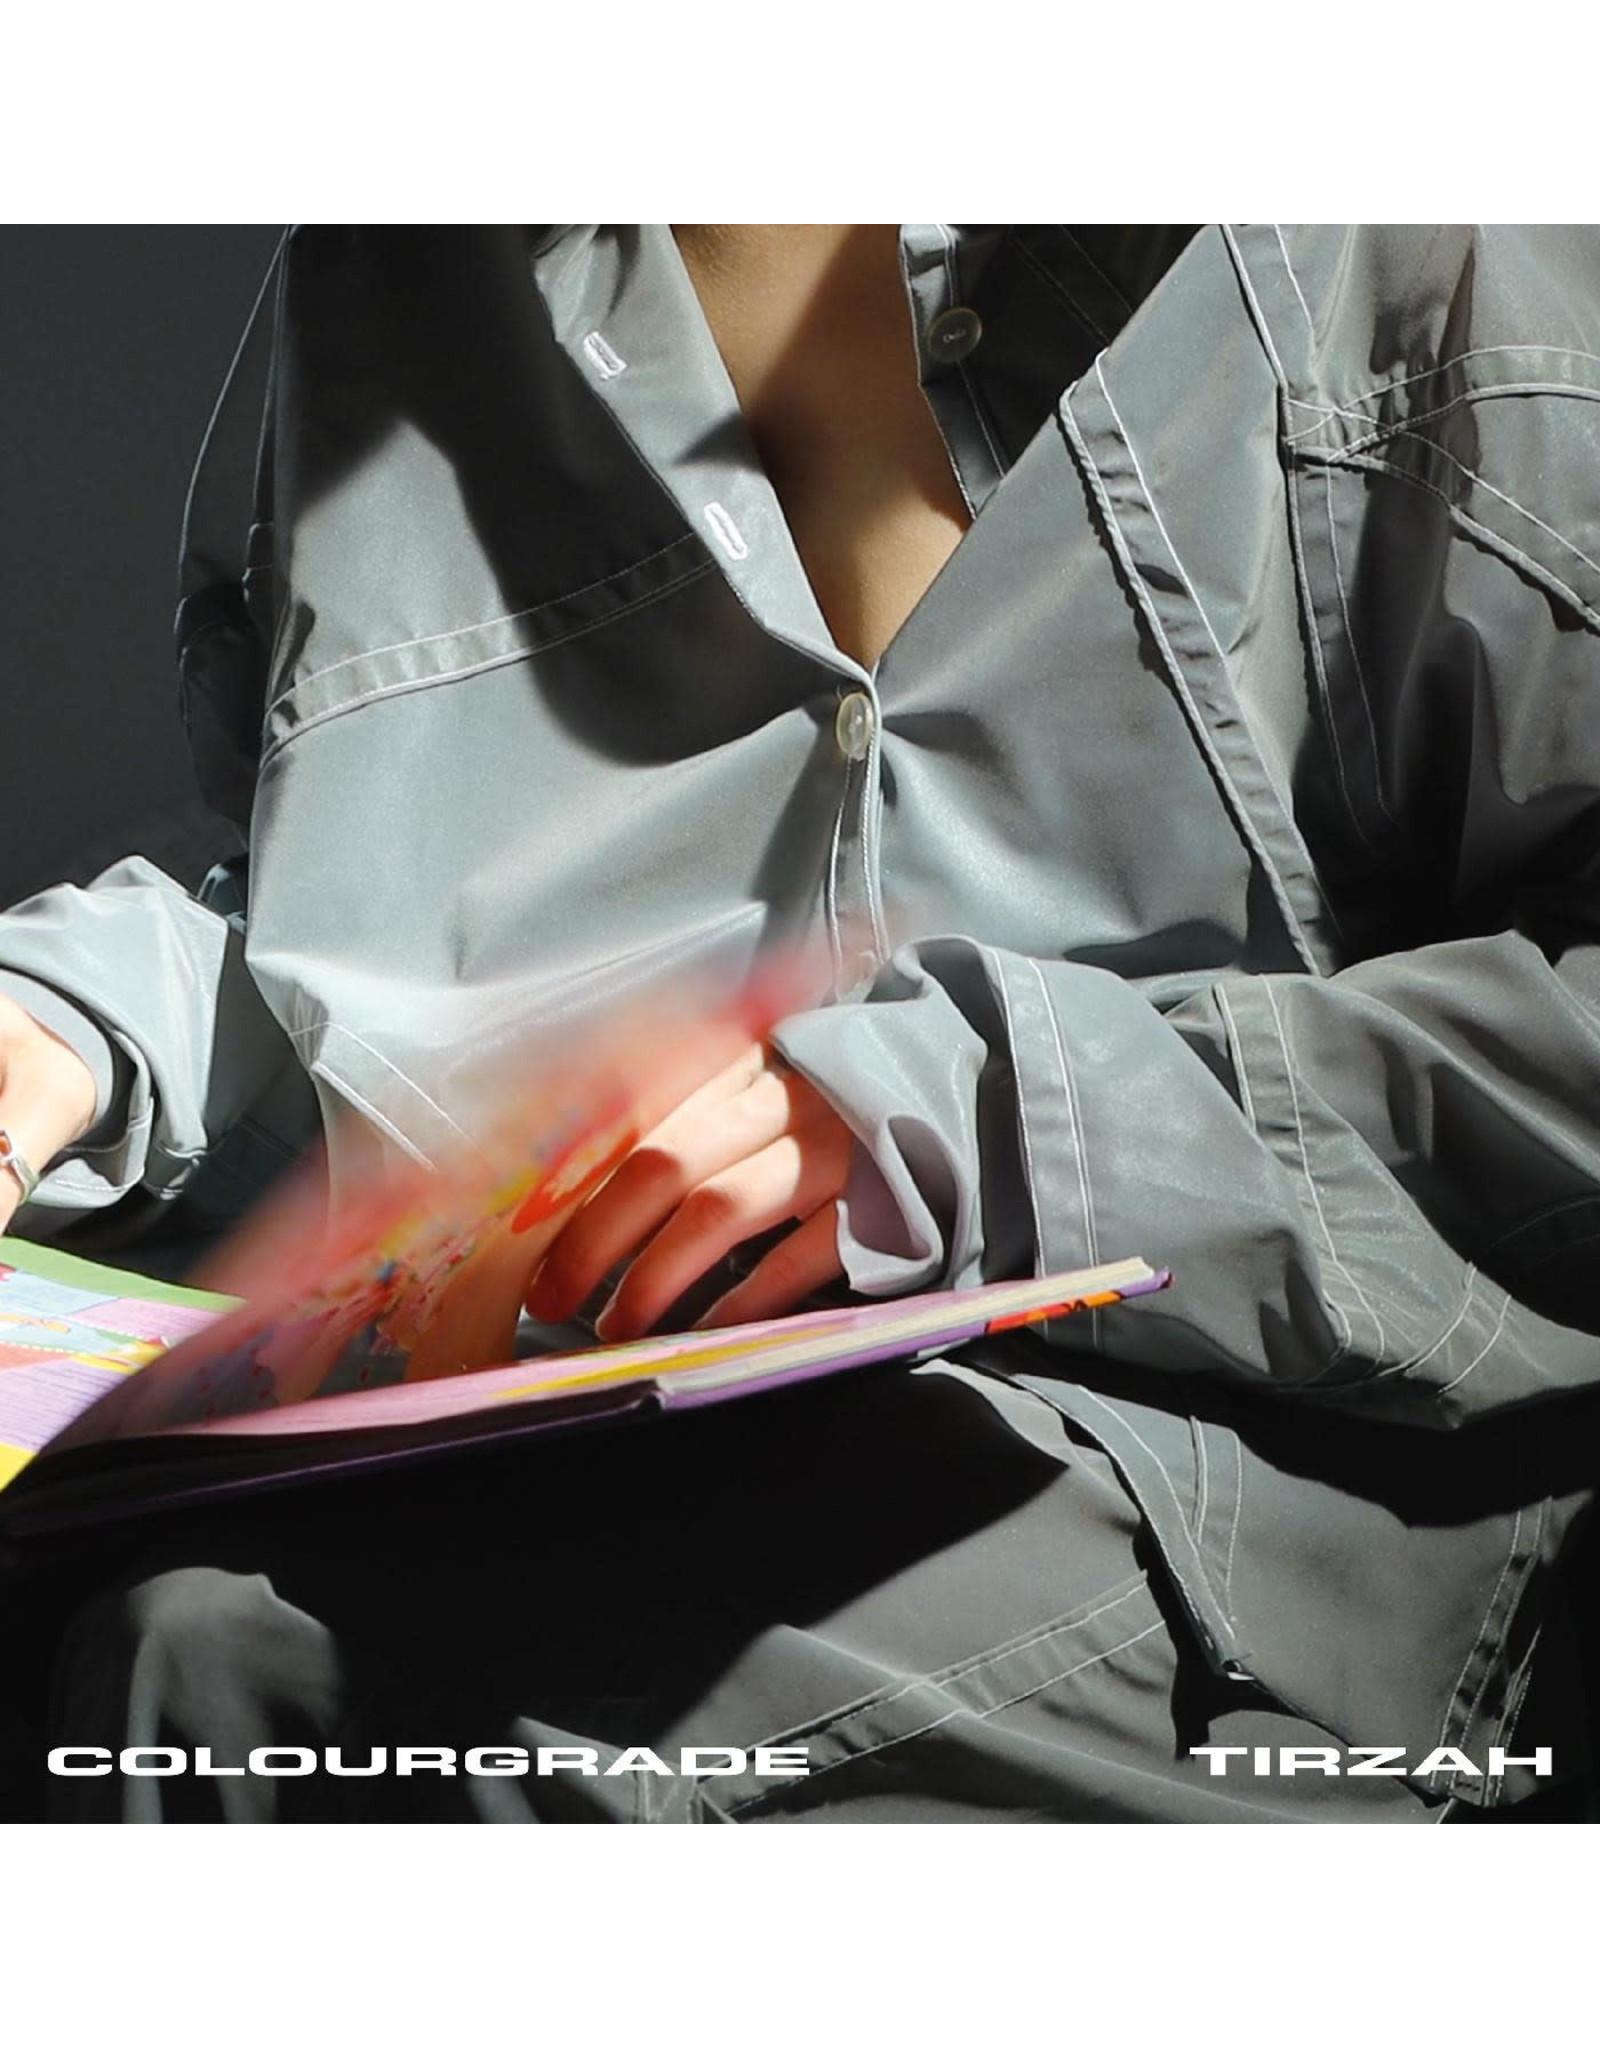 Domino Tirzah: Colourgrade (INDIE EXCLUSIVE, YELLOW VINYL) LP